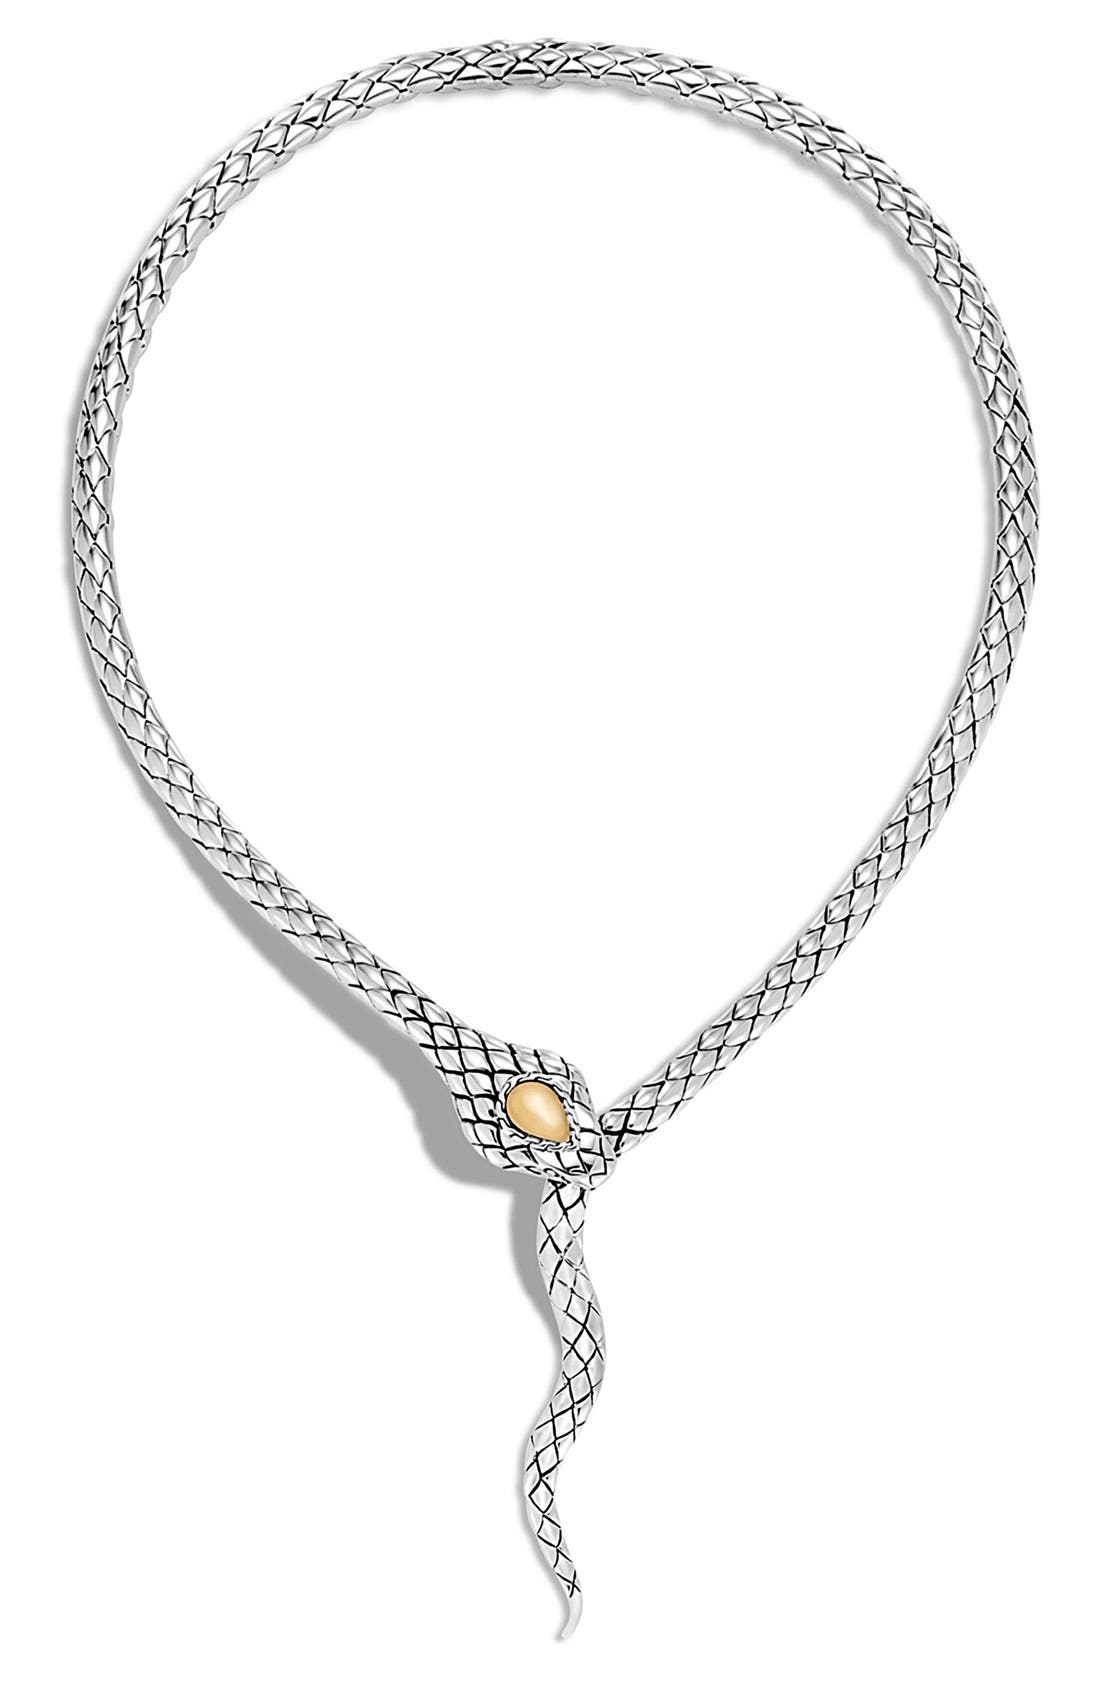 Alternate Image 1 Selected - John Hardy Legends Drop Necklace